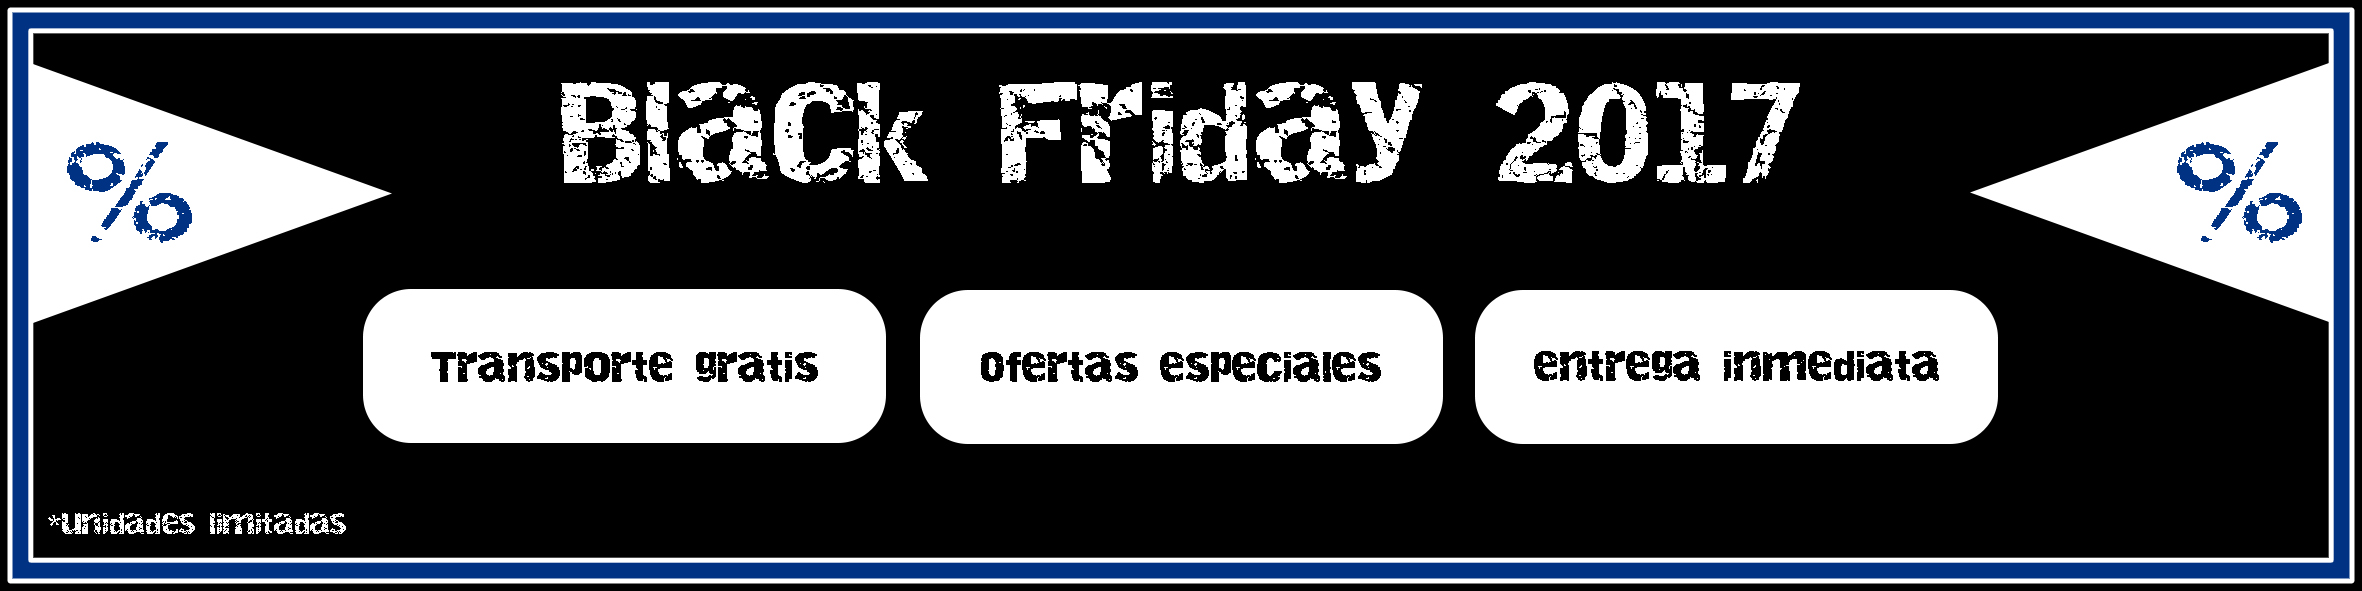 Black Friday 2017 electrodomésticos